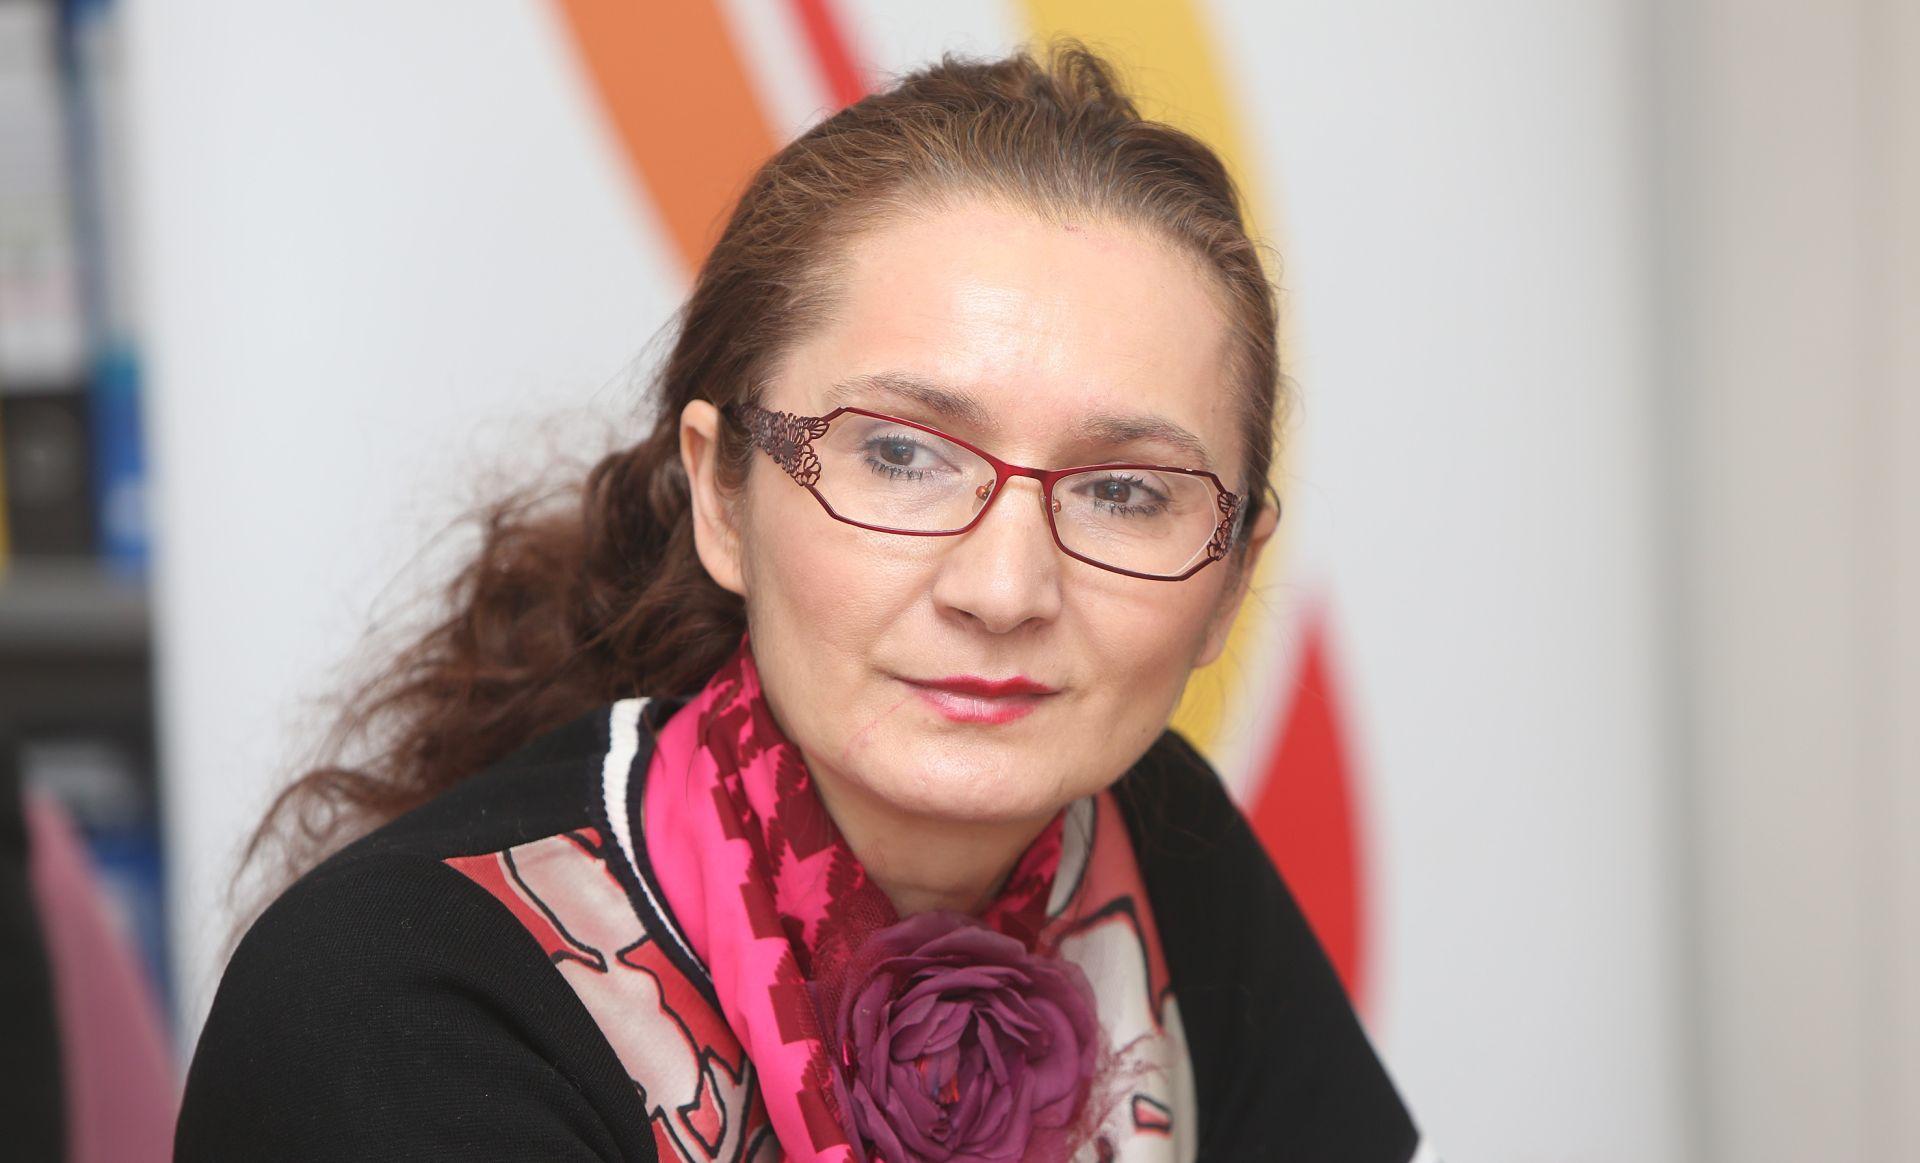 Pravobraniteljica za ravnopravnost spolova o postupcima molitvenih aktivista